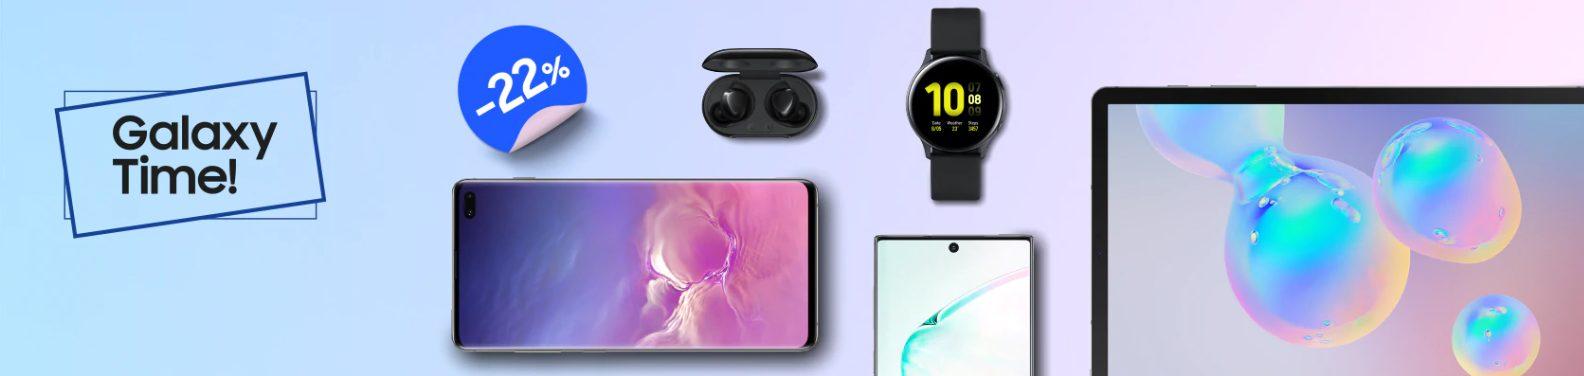 Galaxy-Time-Samsung-Tech-Princess